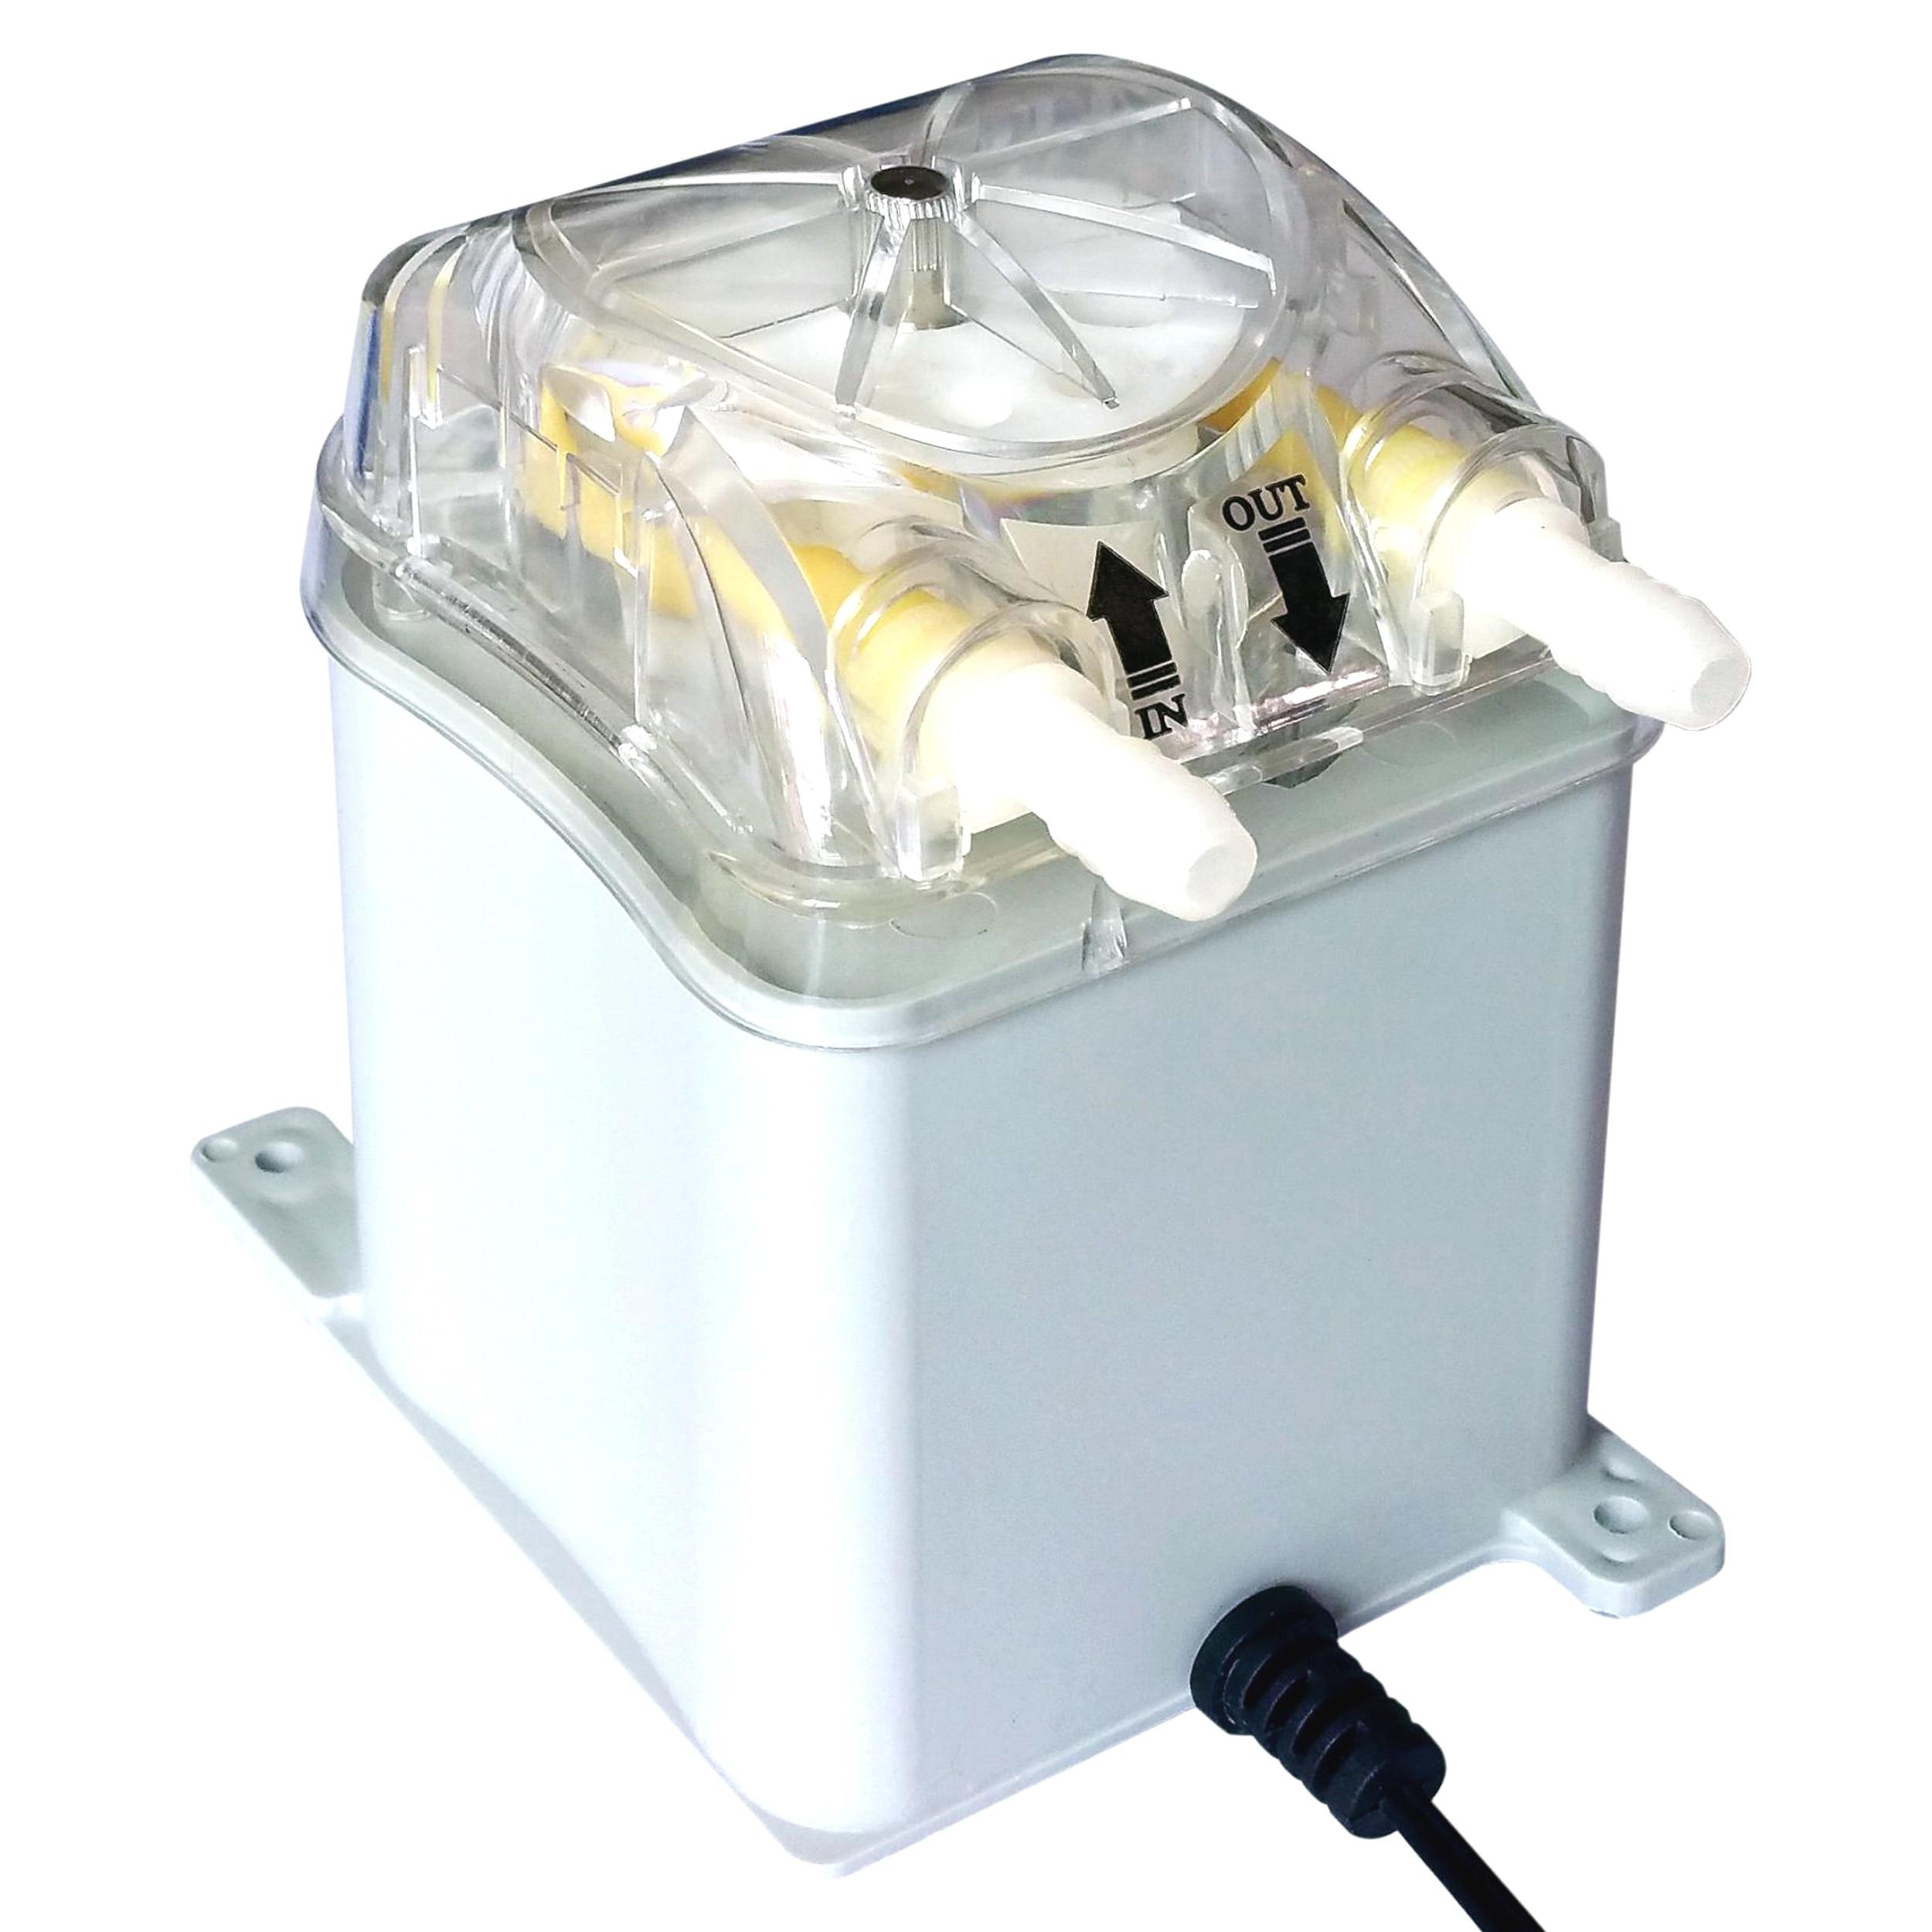 1000 مللي/دقيقة ، 30psi ، Honlite 24V تحوي مضخة مع صرف مضخة رئيس و فارميد BPT تحوي أنبوب